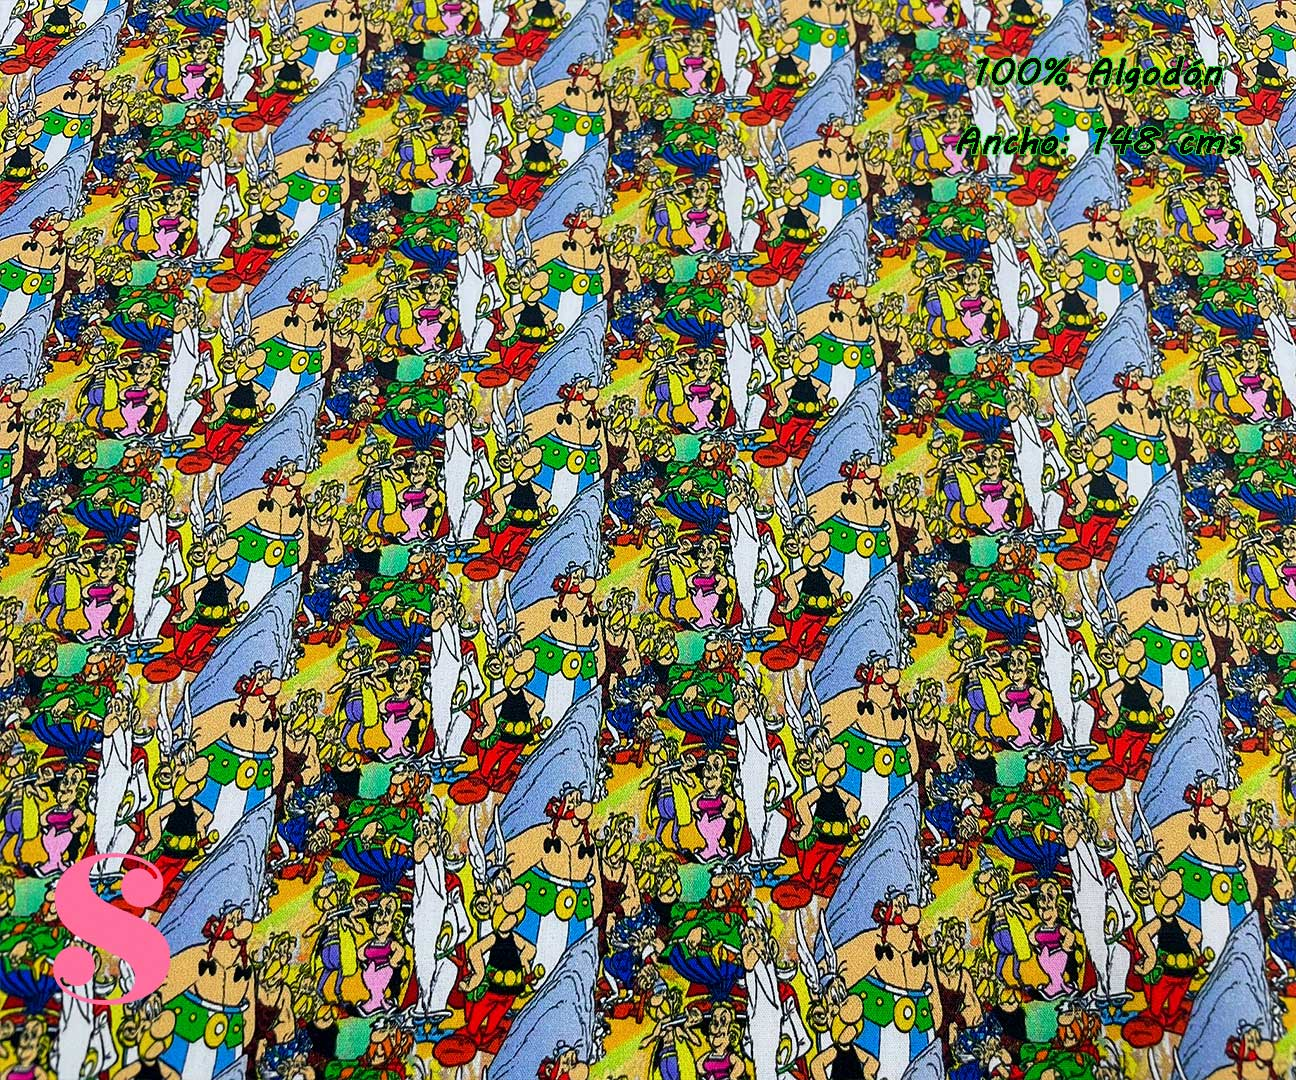 5-telas-disney,telas-infantiles,telas-frikis,estampados-disney,estampados-disney,tela-asterix-y-obelix,Tejido Estampado Asterix y Obelix